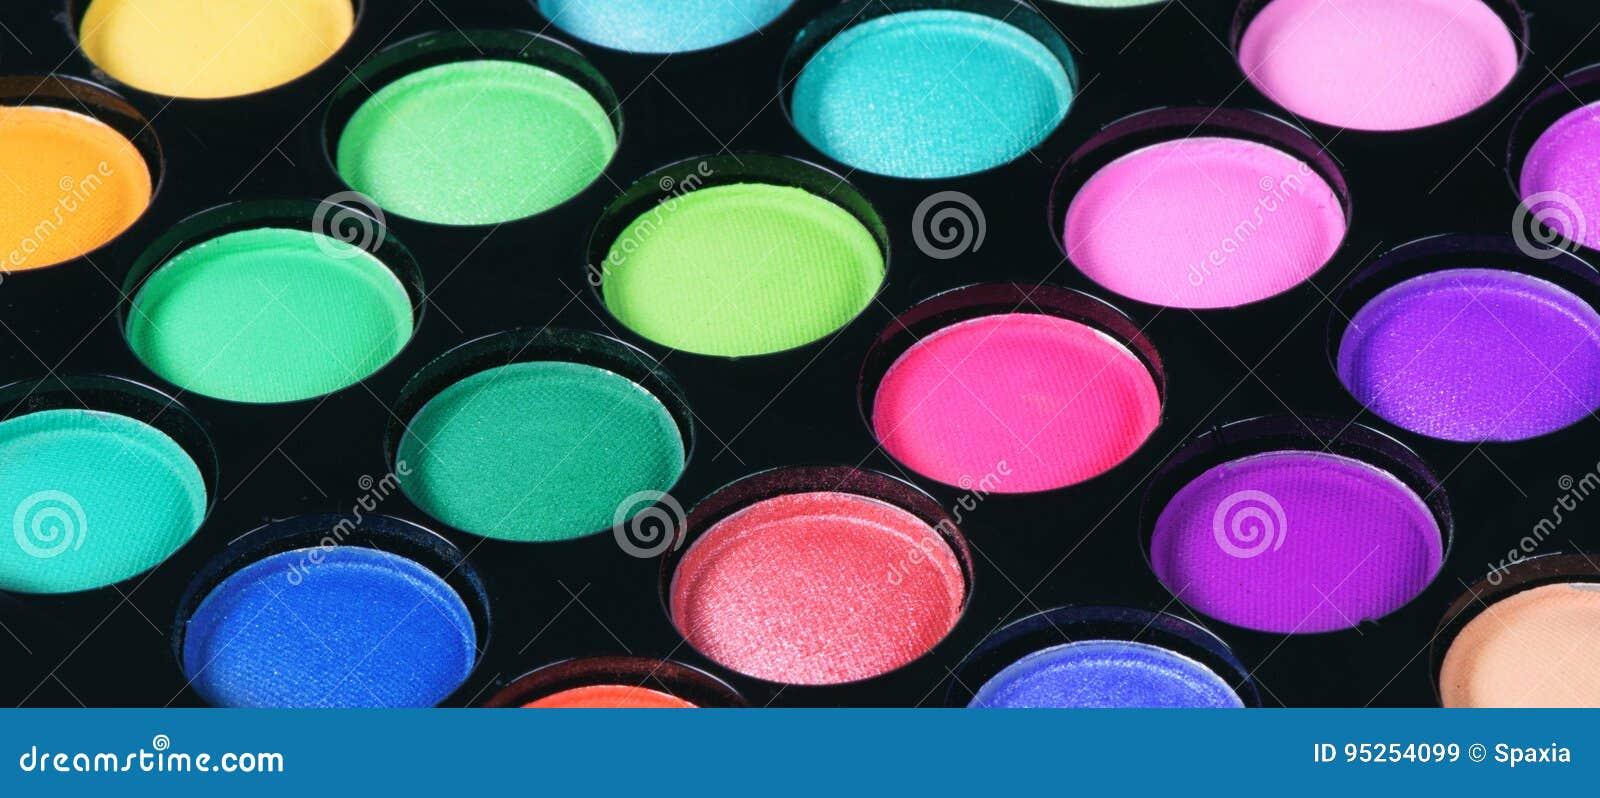 Colorful eye shadows palette